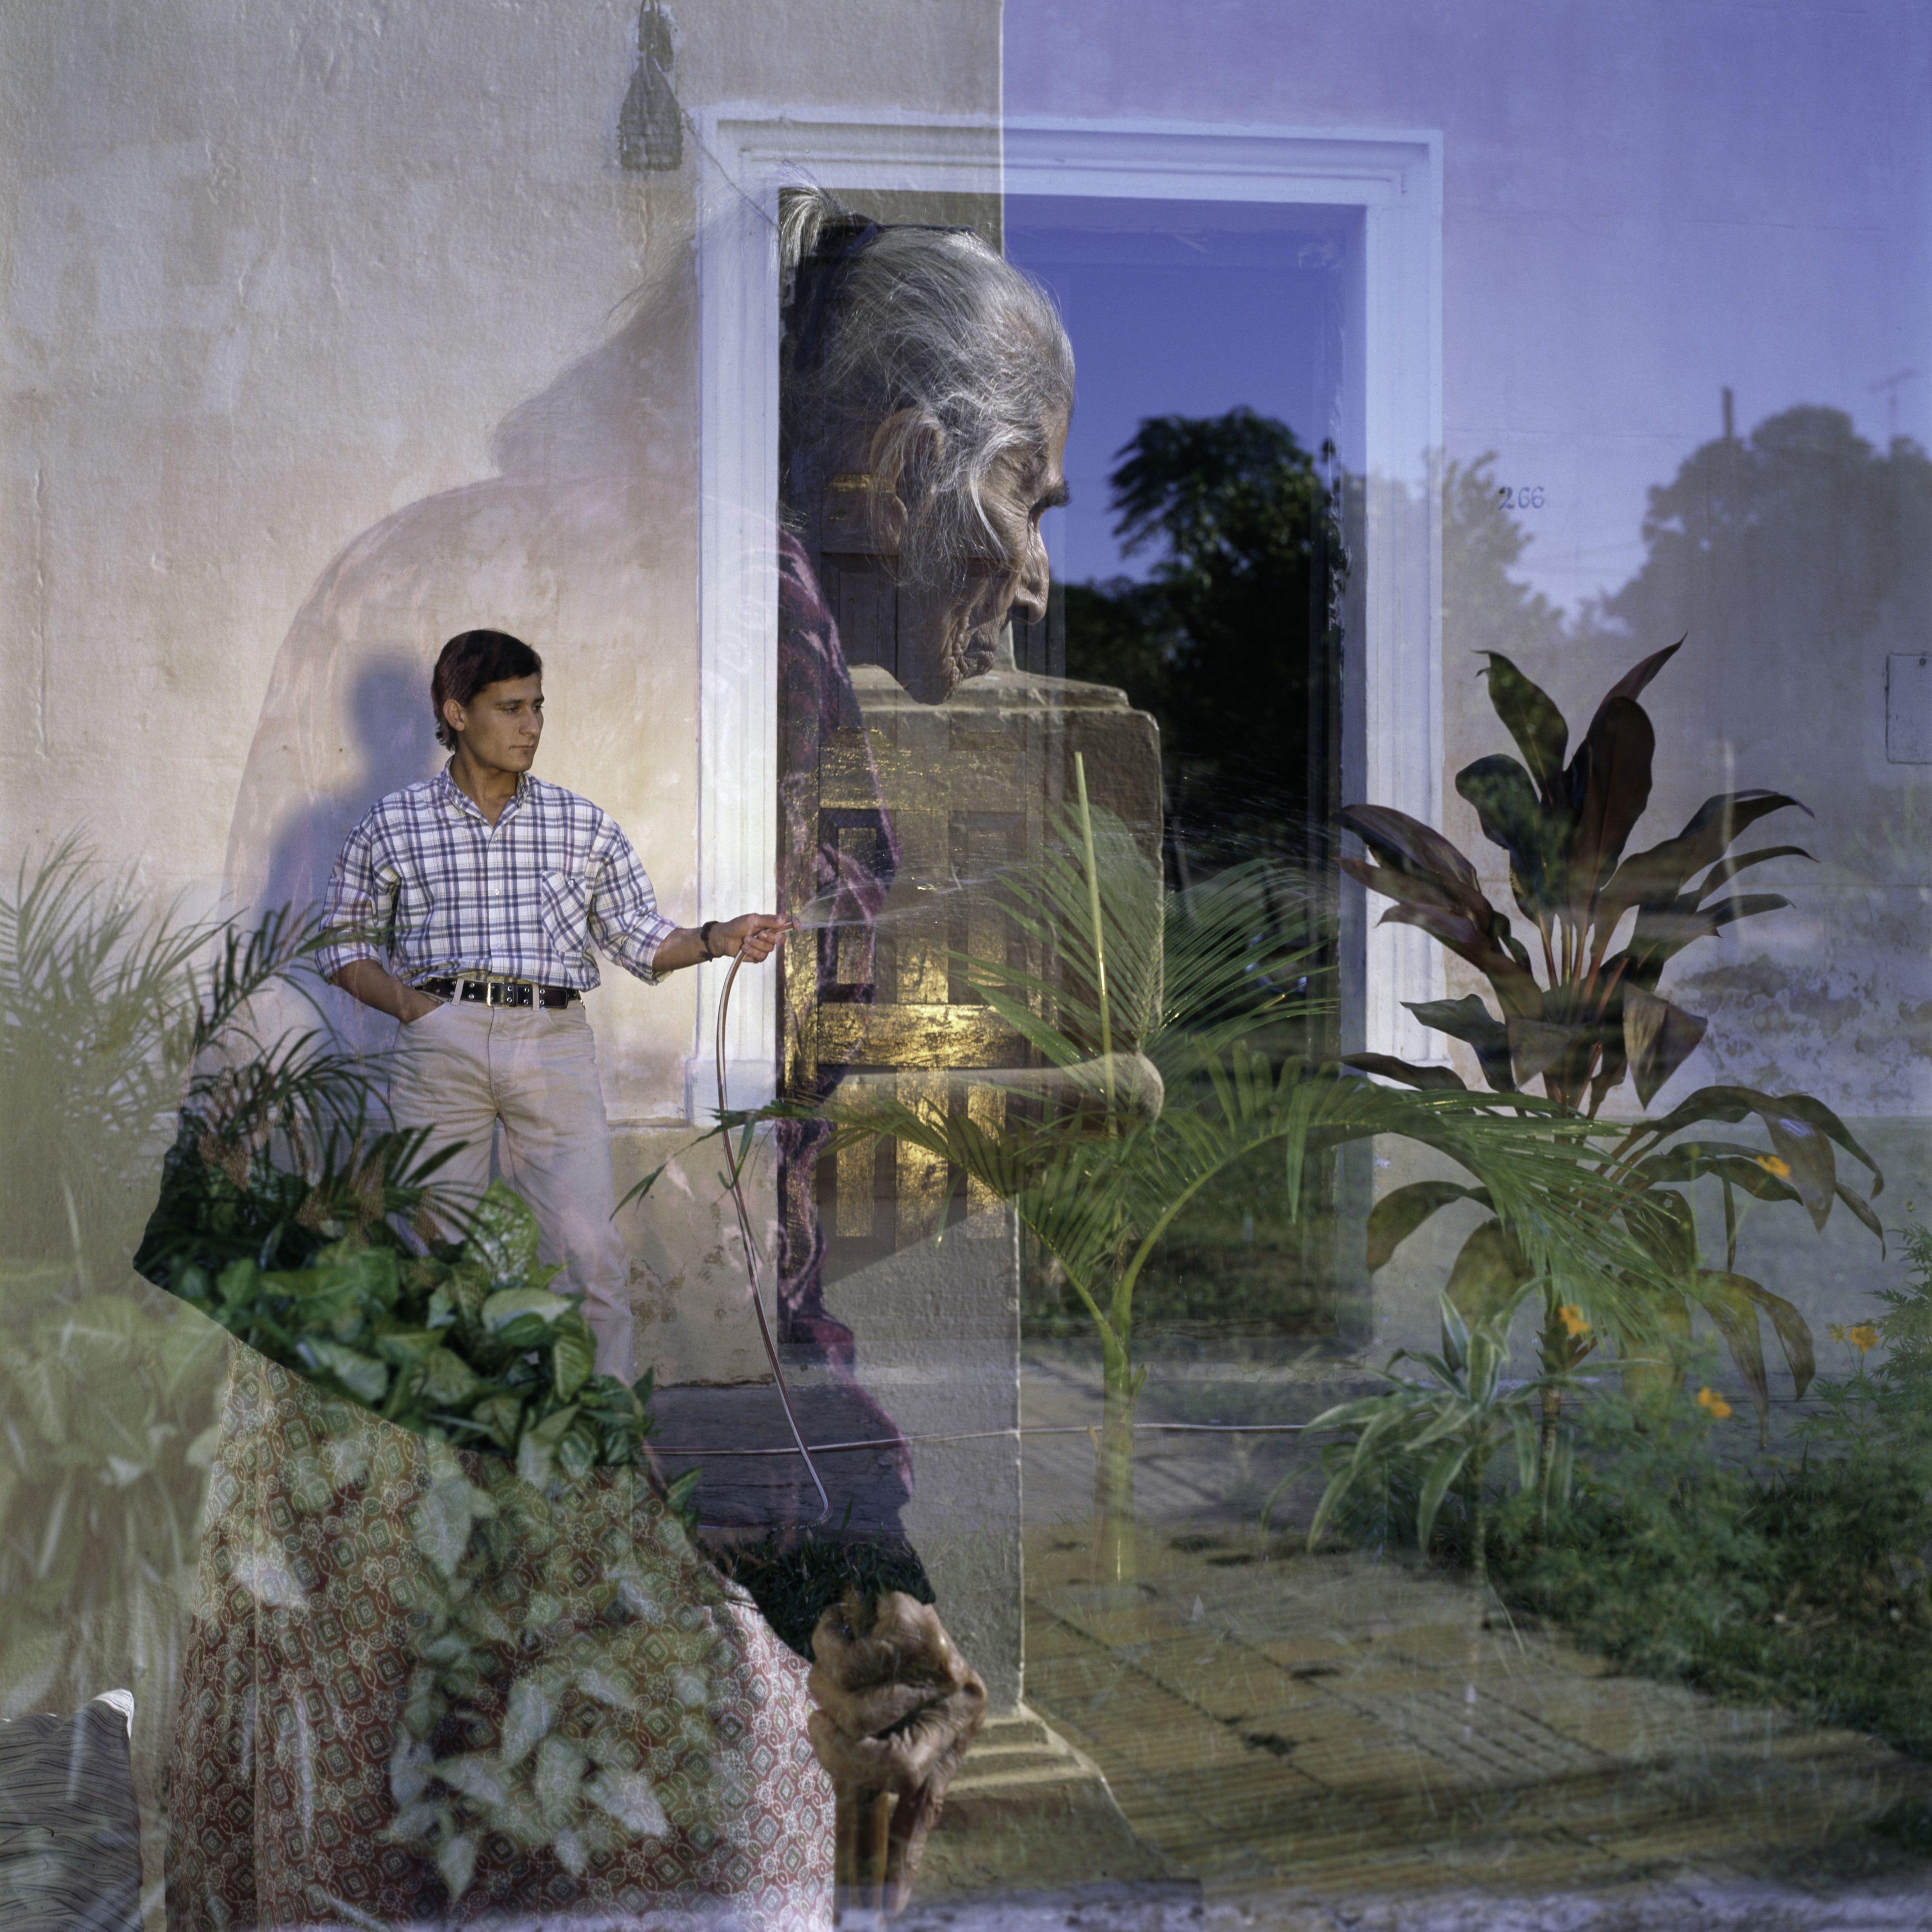 Two Gardens. Pehuajo´, Argentina. 1995 © Alessandra Sanguinetti / Magnum Photos